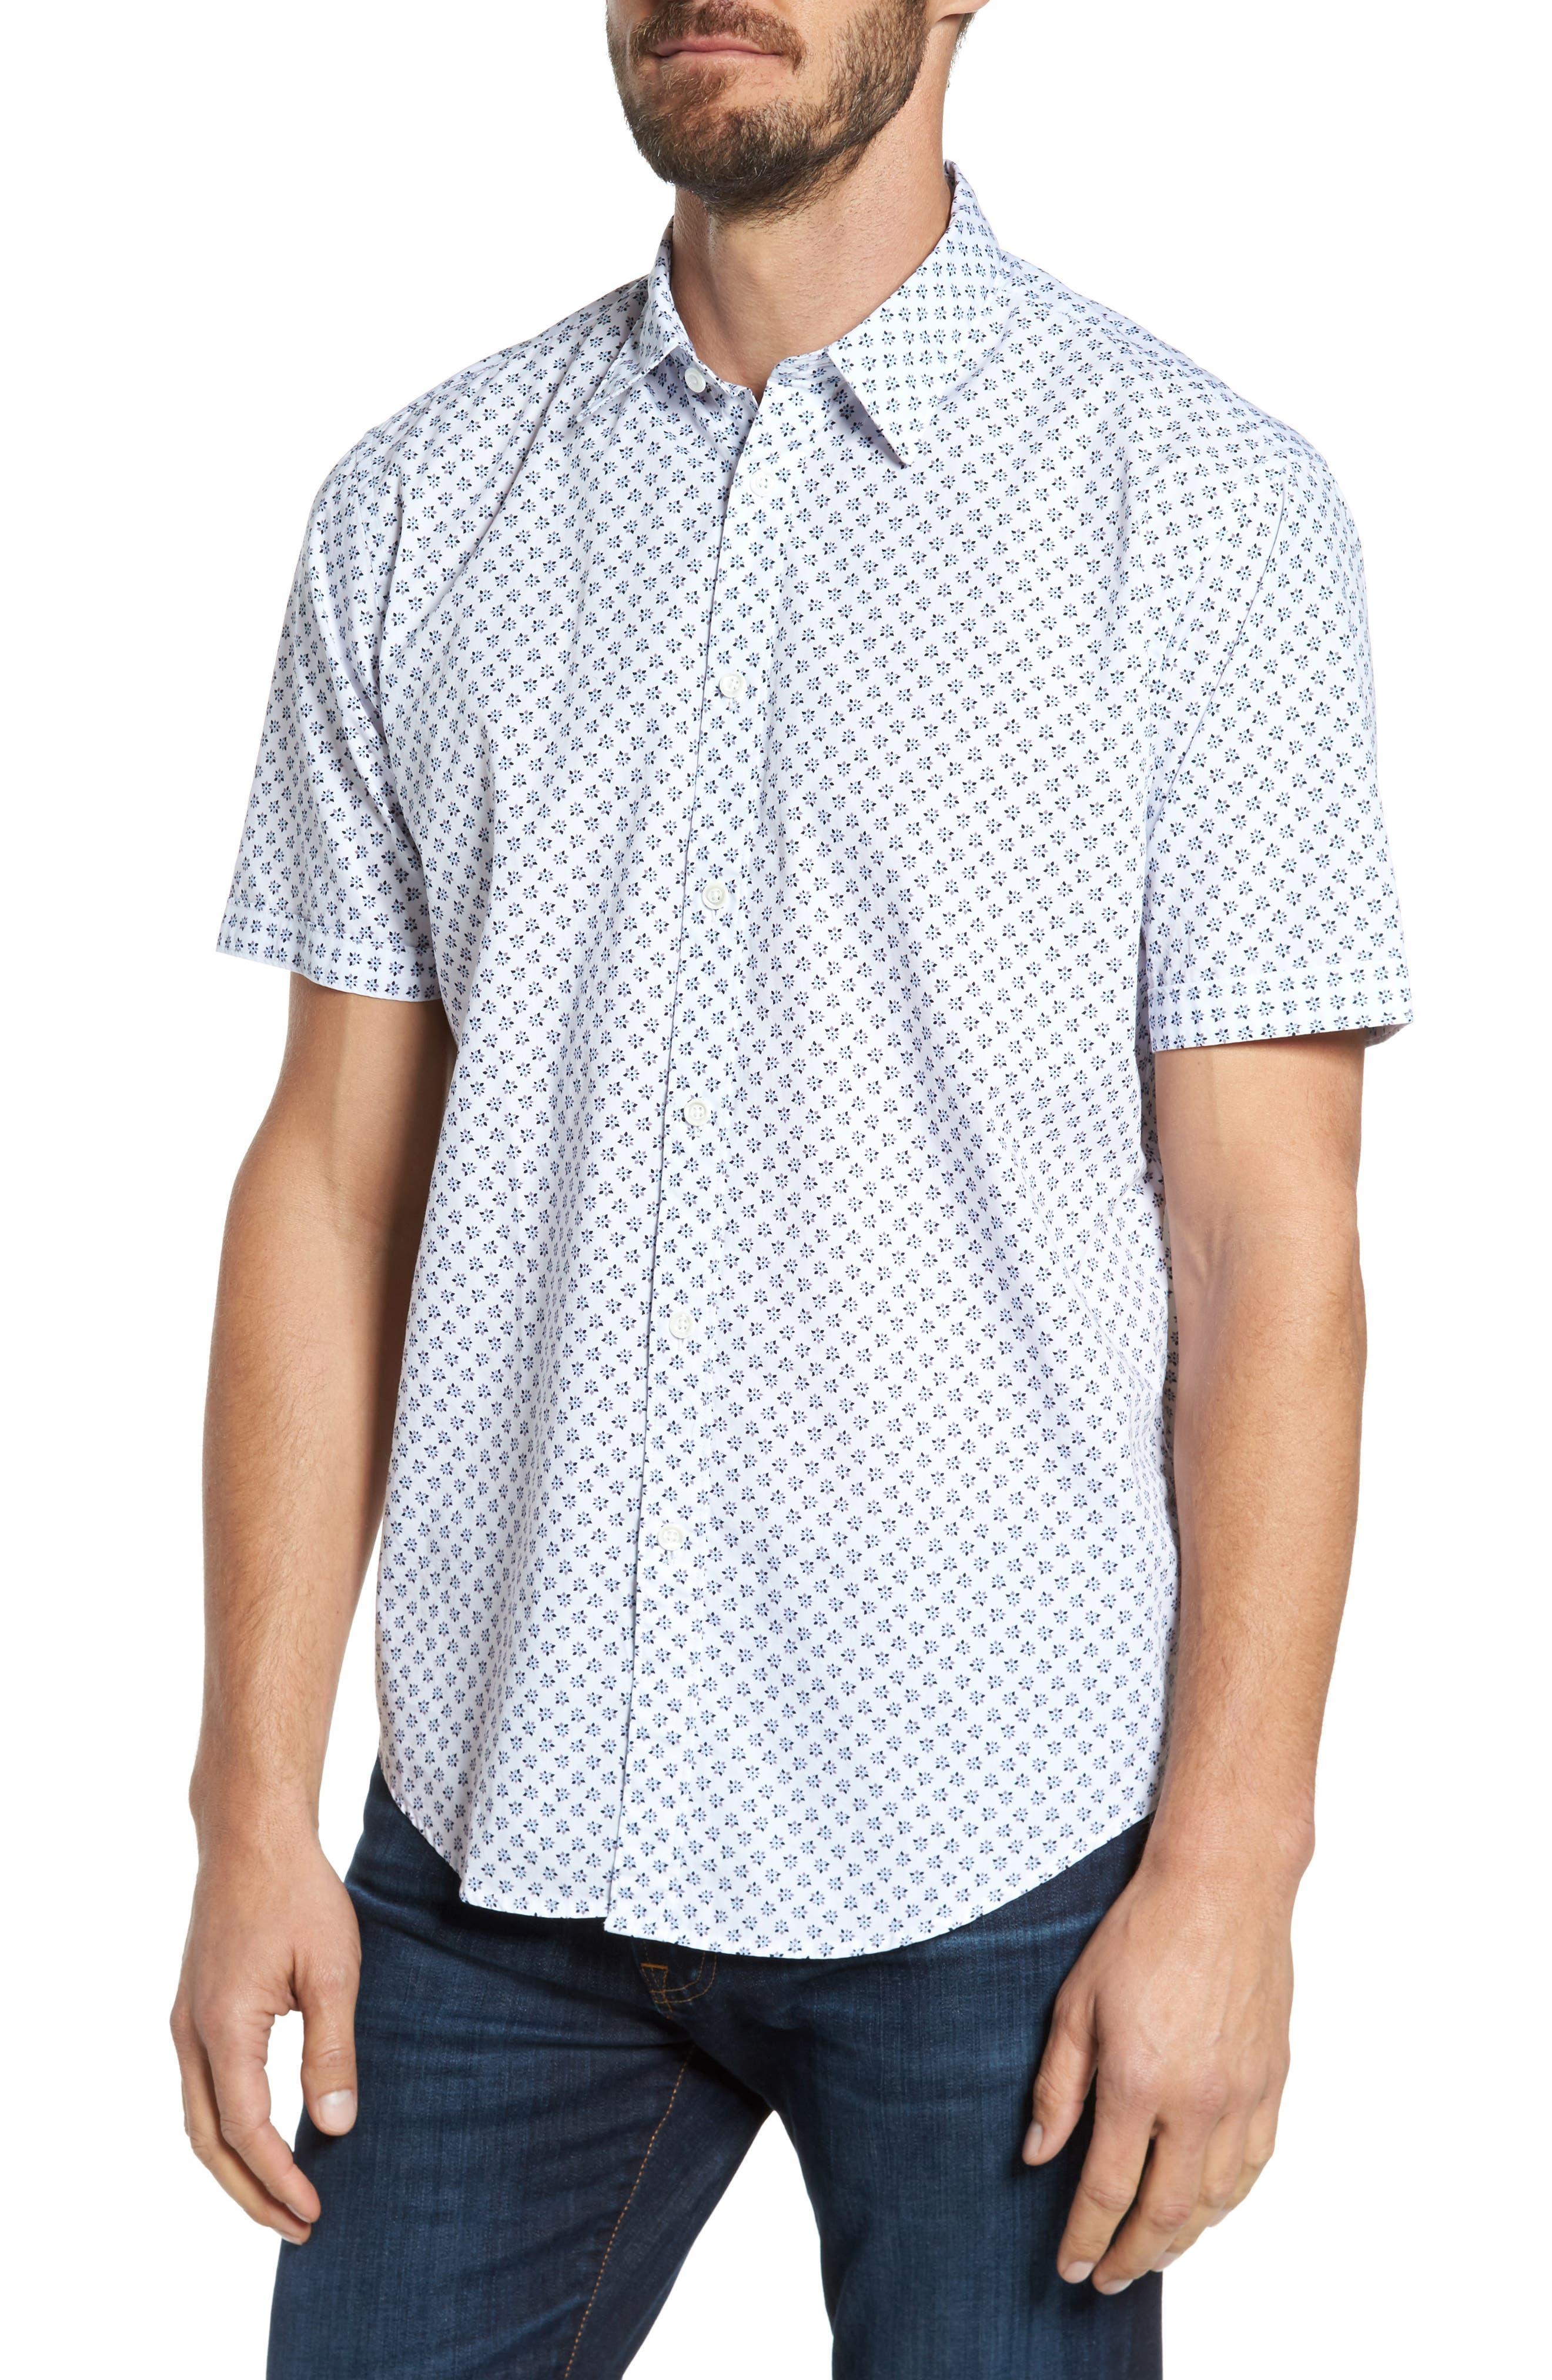 Coastaoro Santo Regular Fit Print Sport Shirt